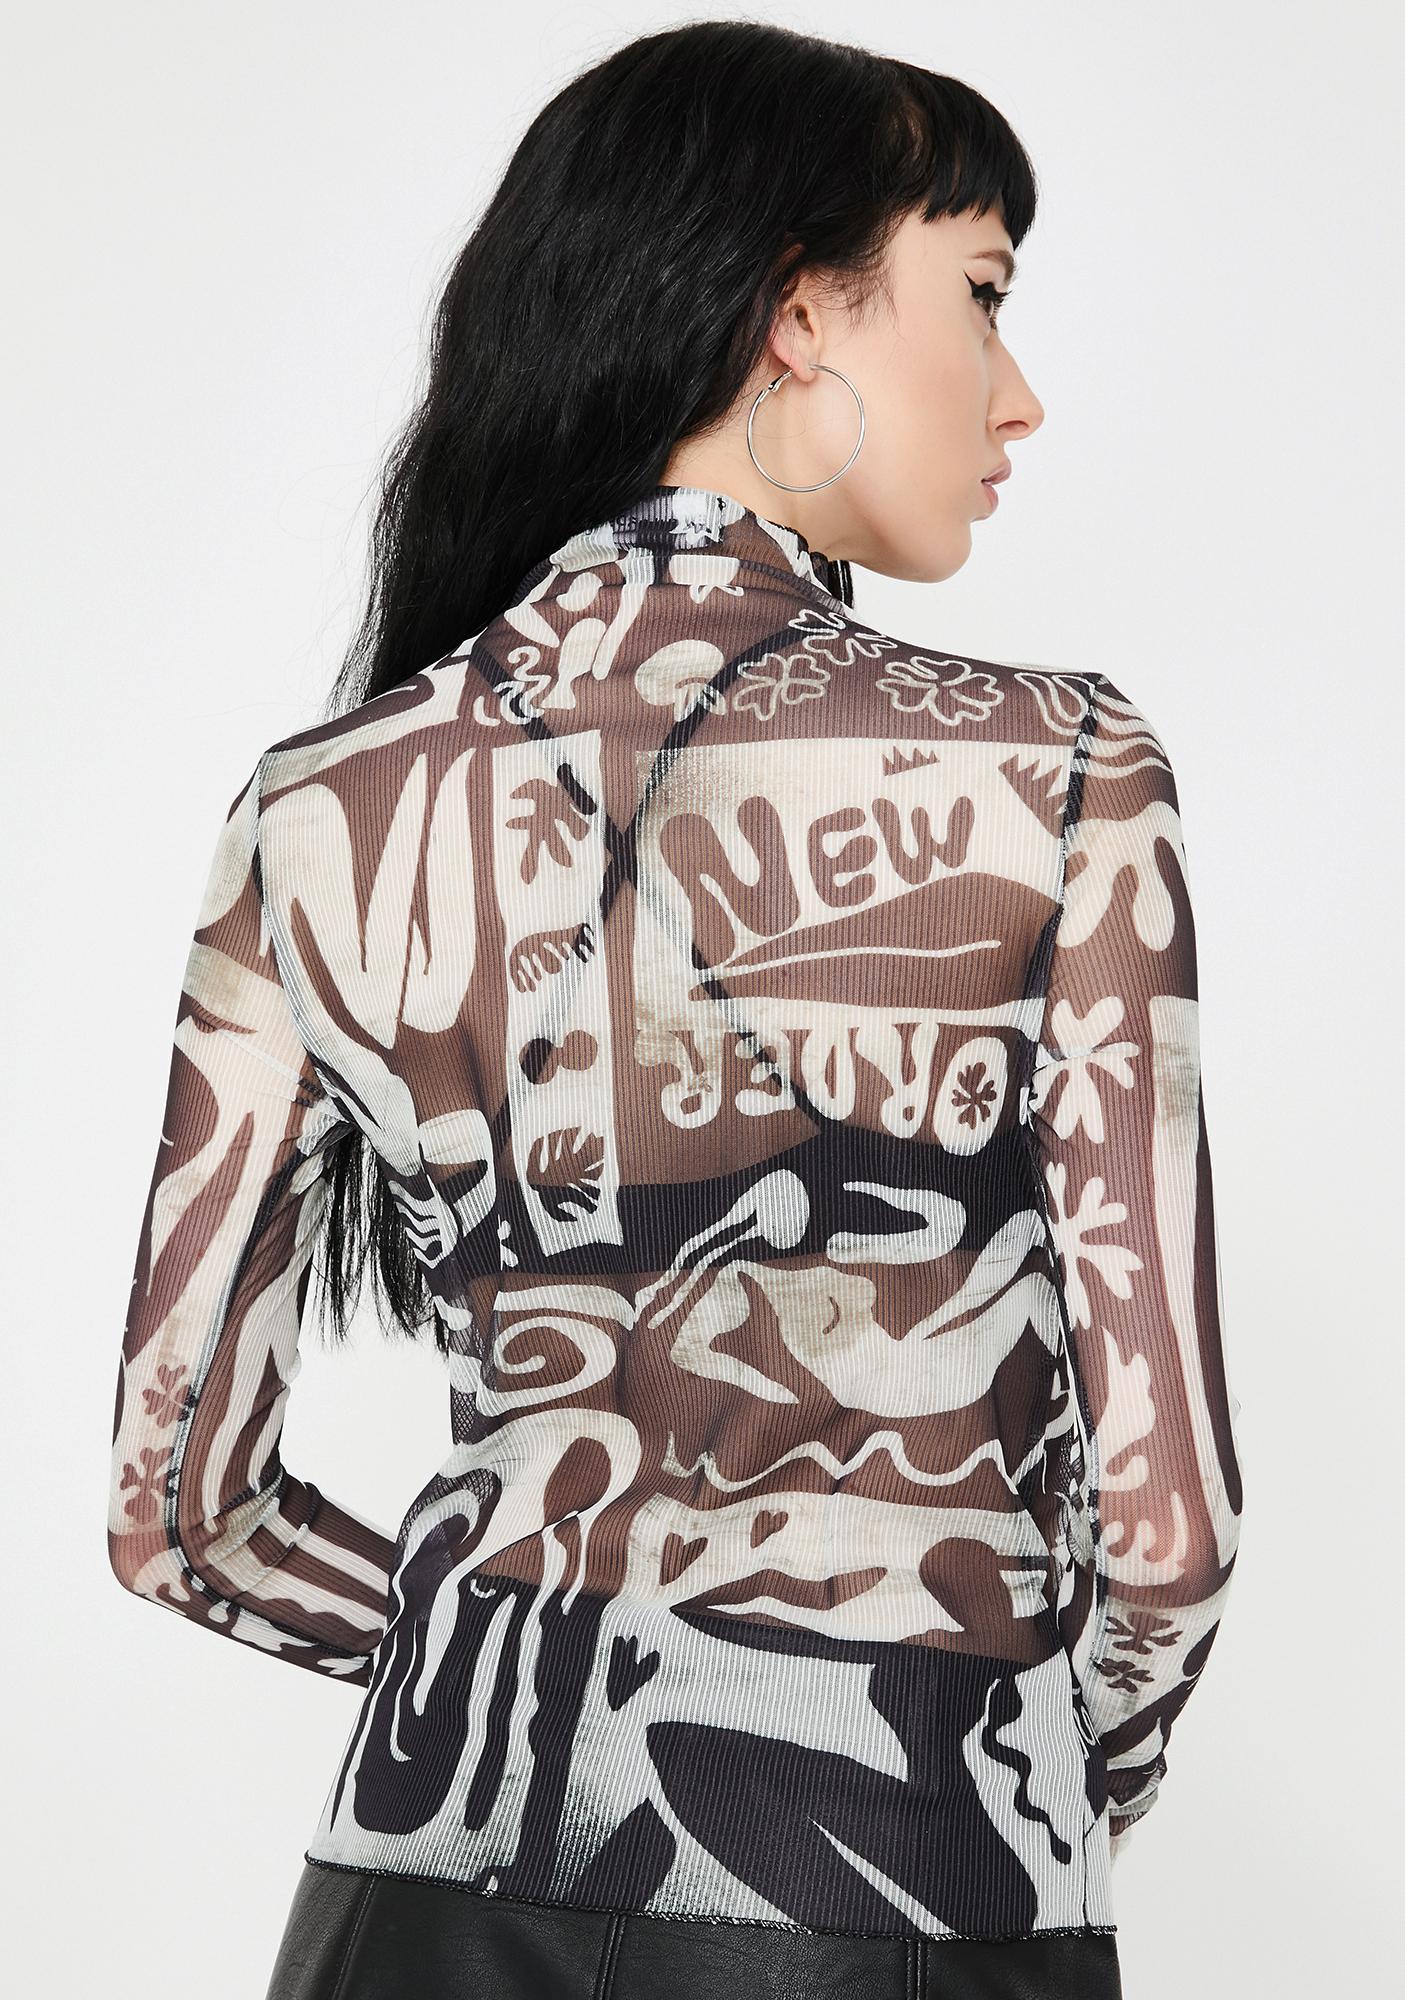 NEW GIRL ORDER Abstract Print Mesh Top